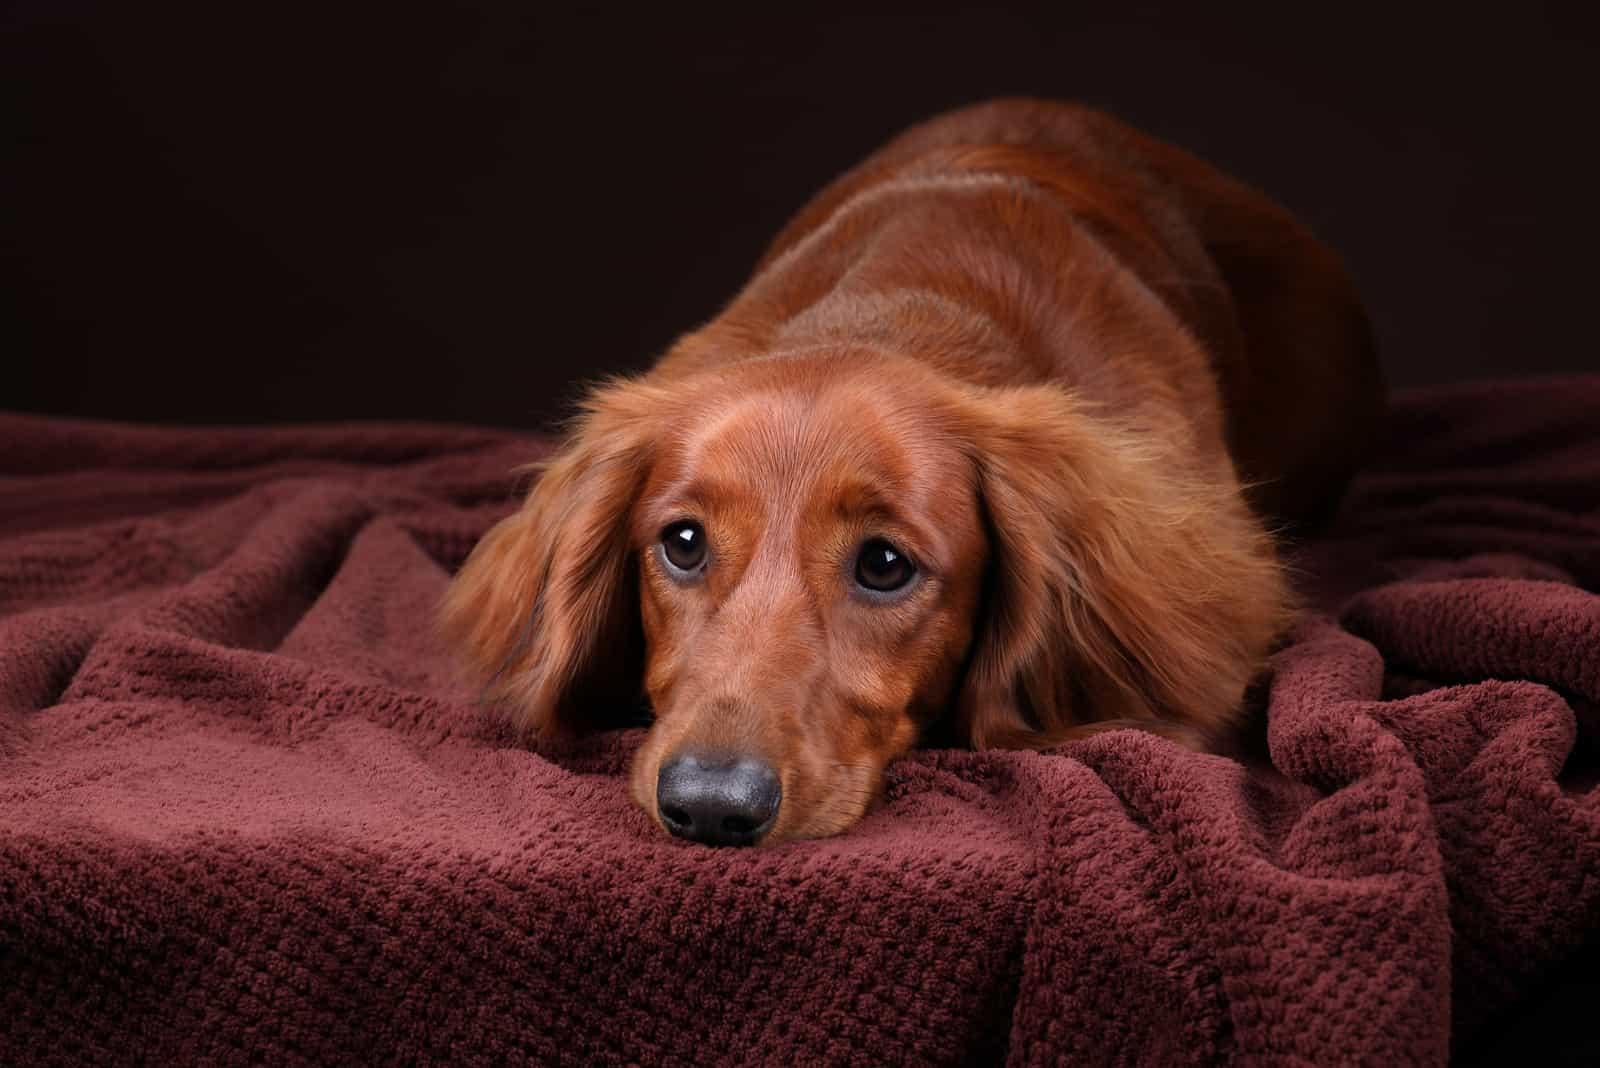 Beautiful and sad dachshund dog